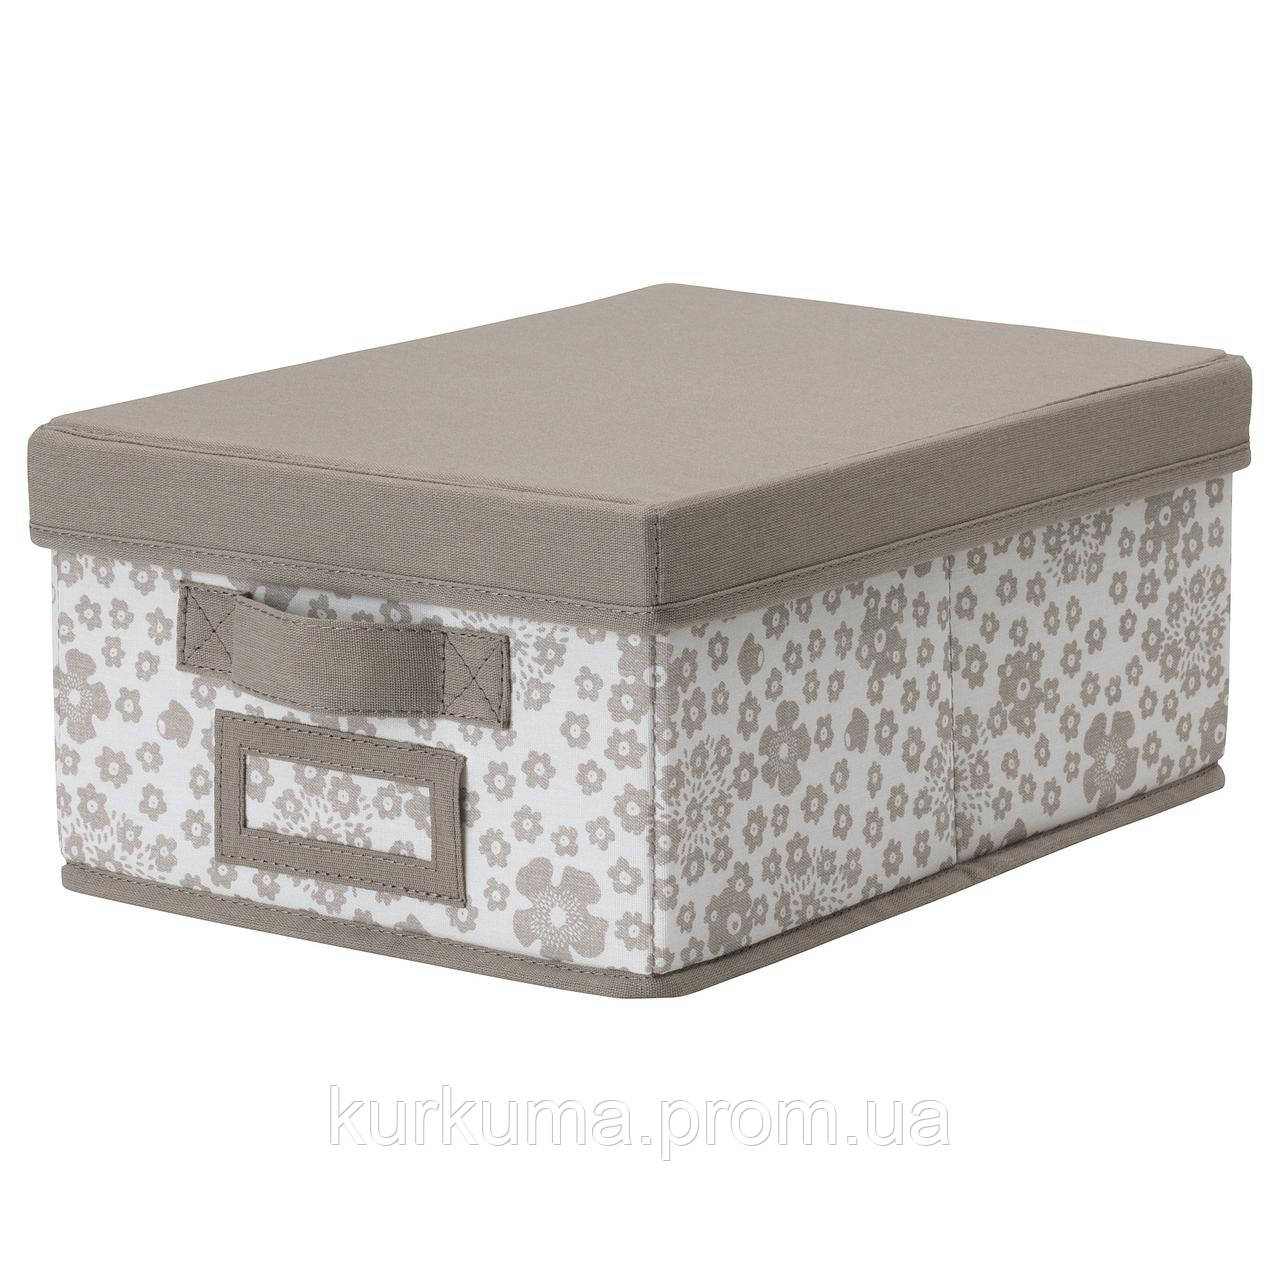 IKEA STORSTABBE Коробка с крышкой, бежевый  (704.103.67)